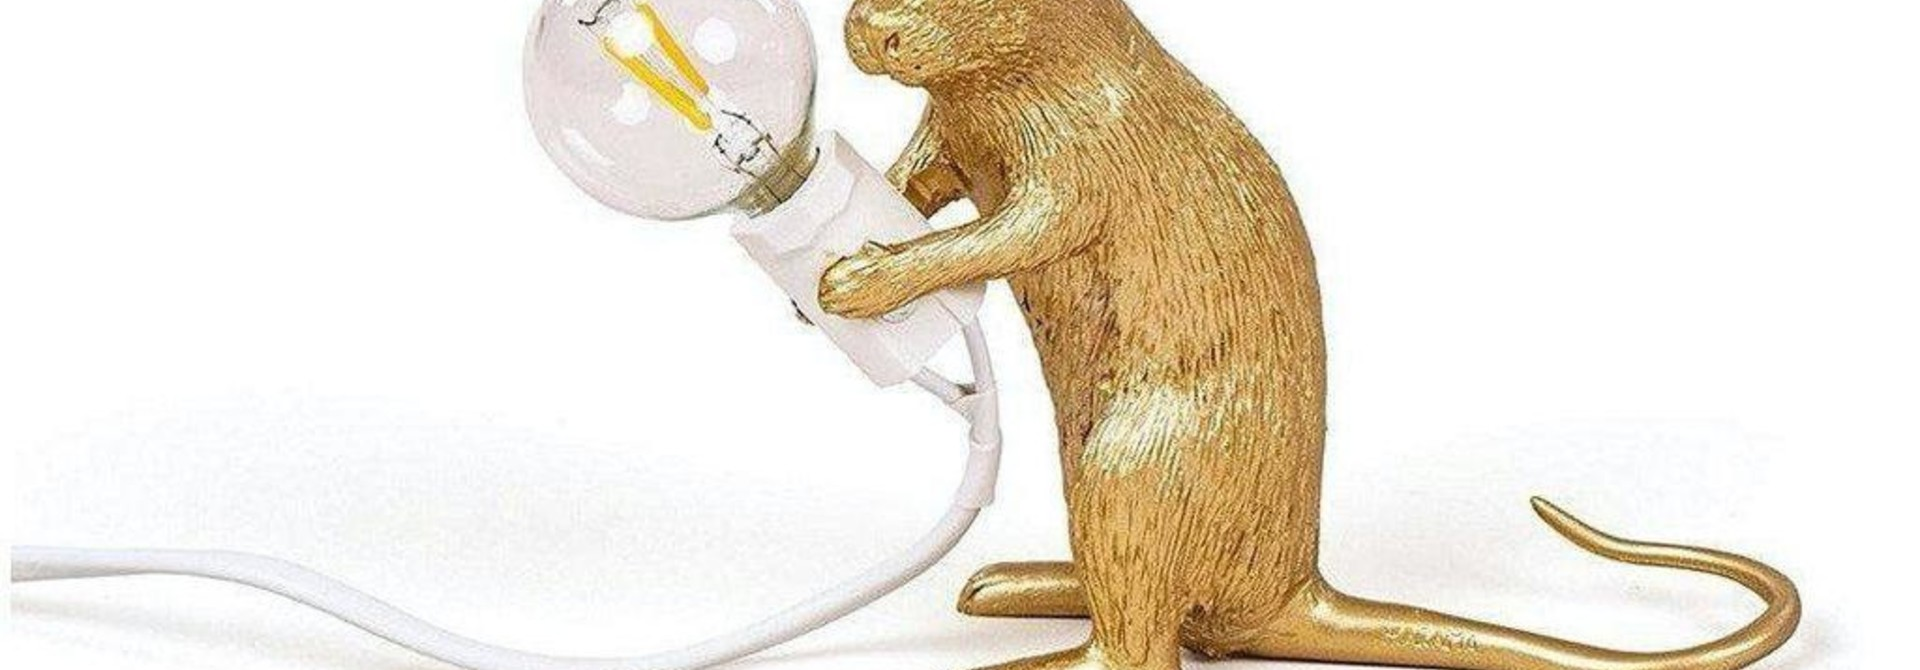 SELETTI - Golden Mouse Lamp